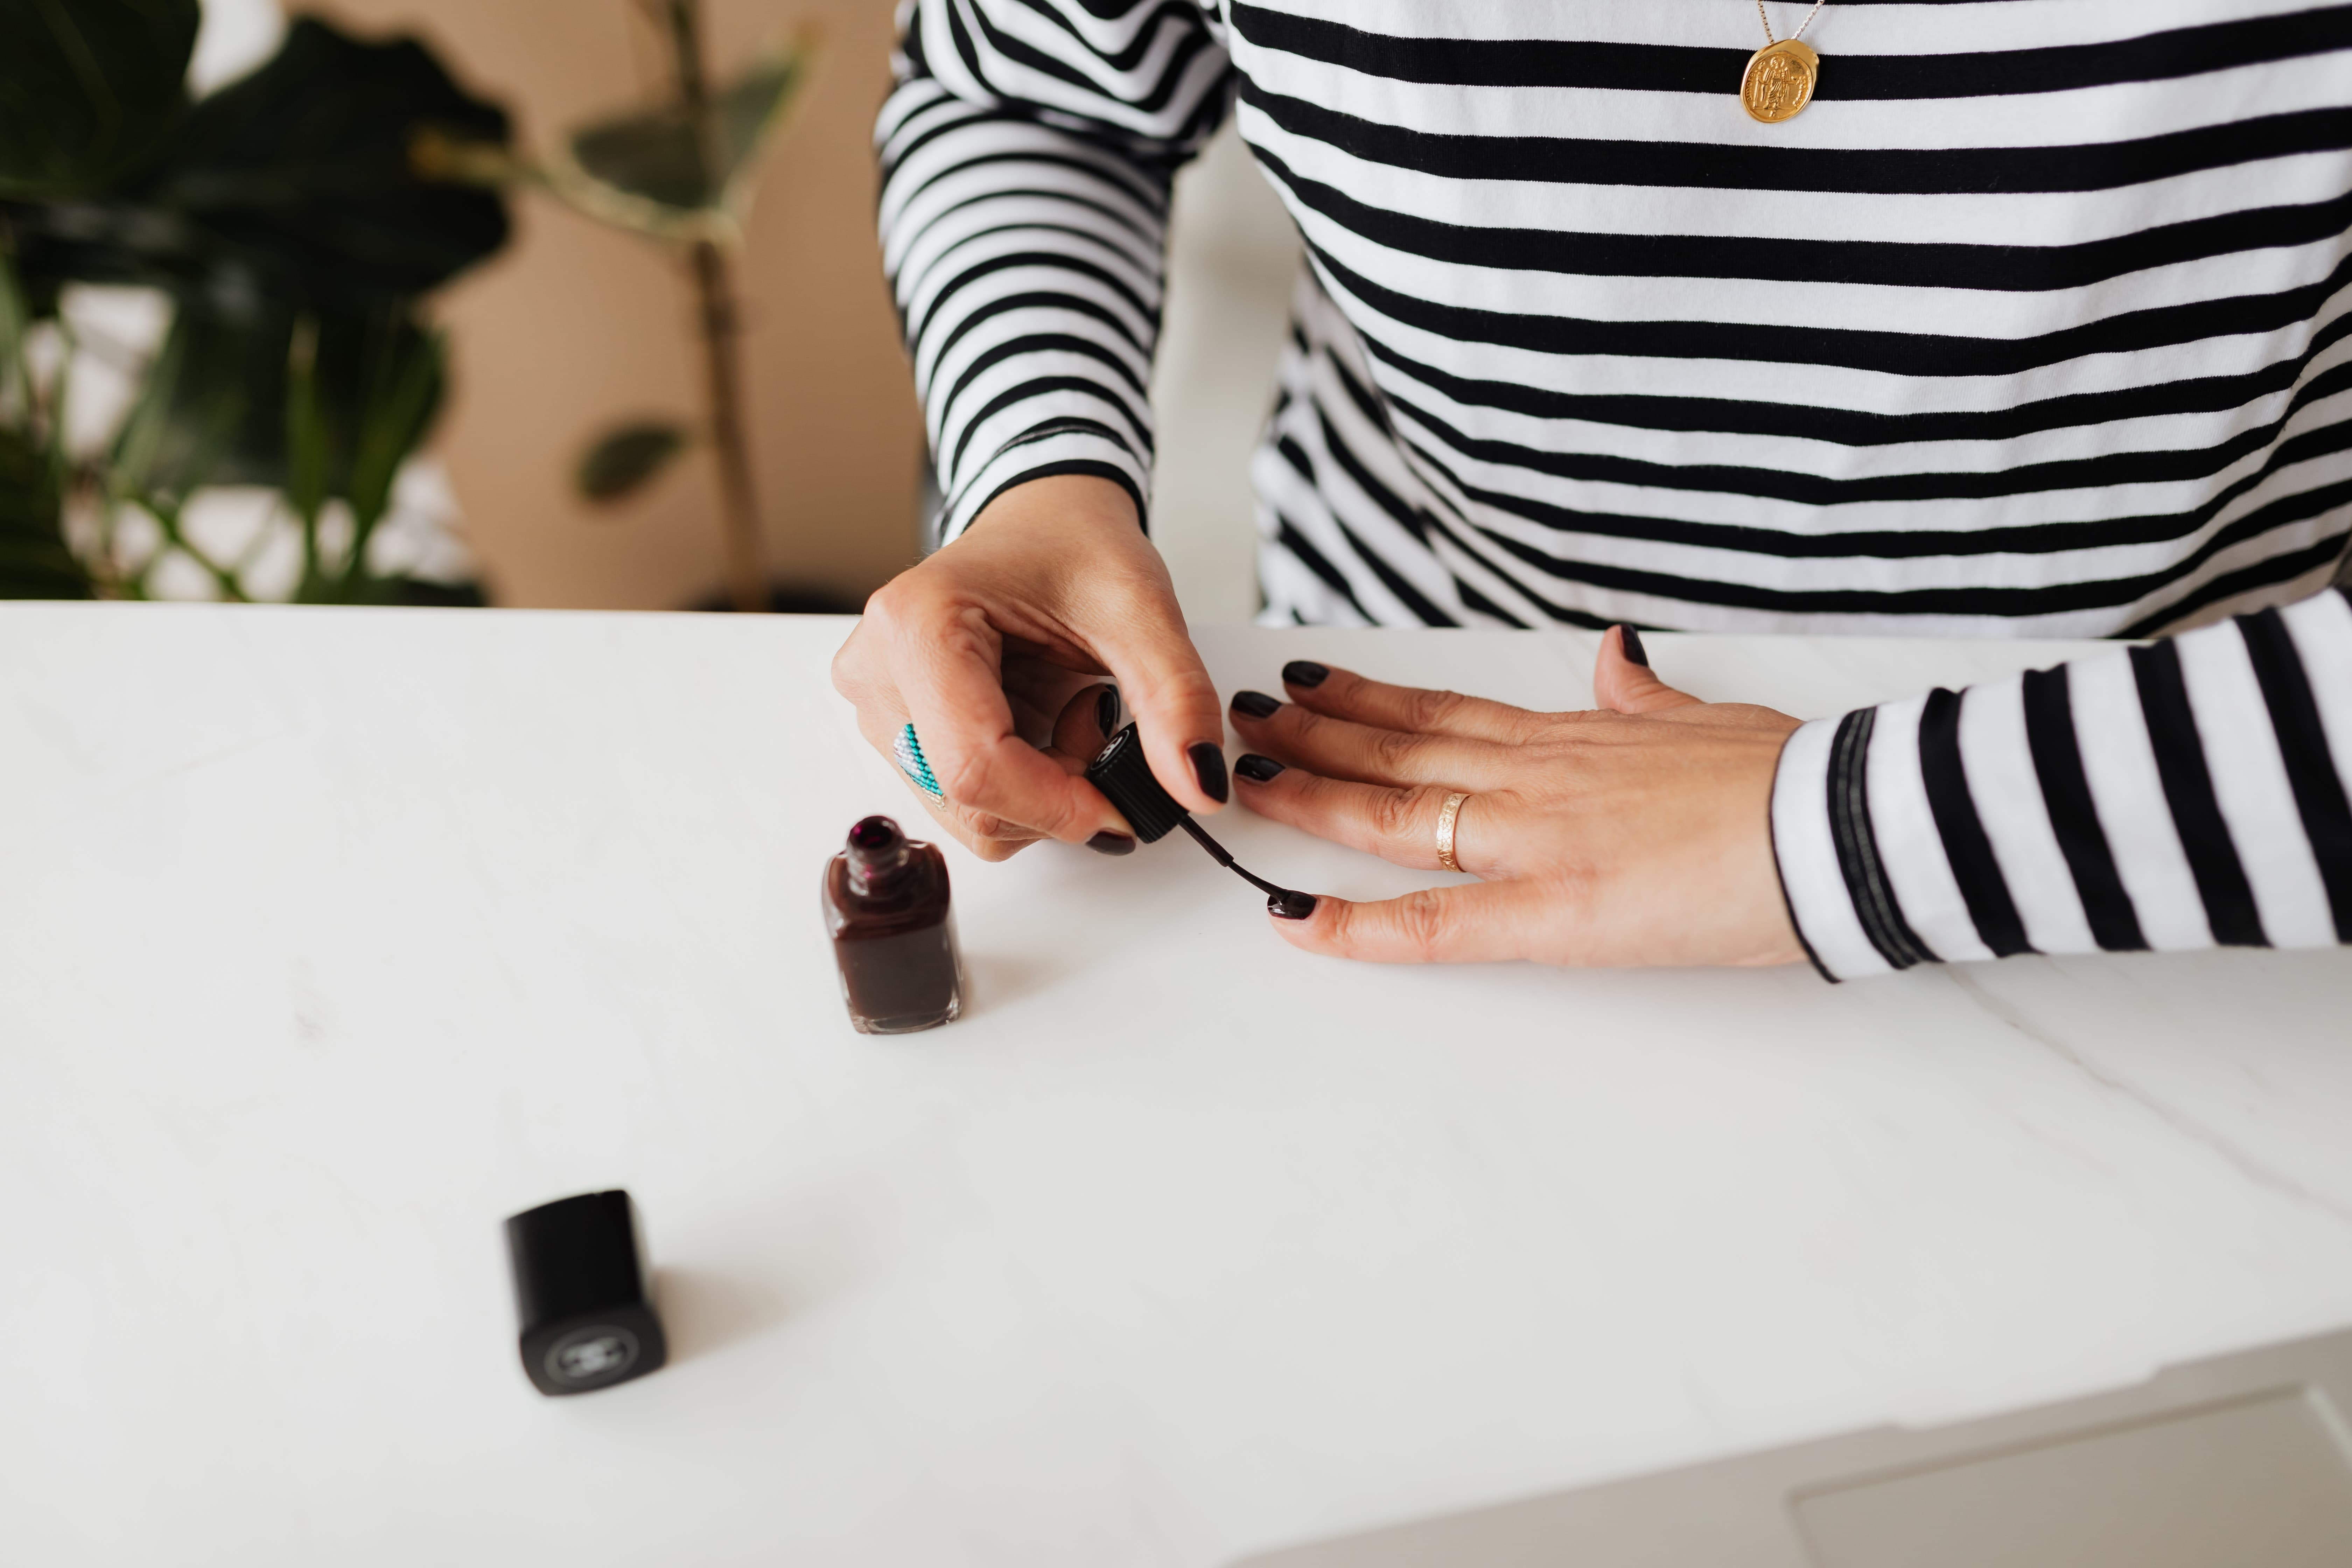 Nail Salon Sanitation Checklist